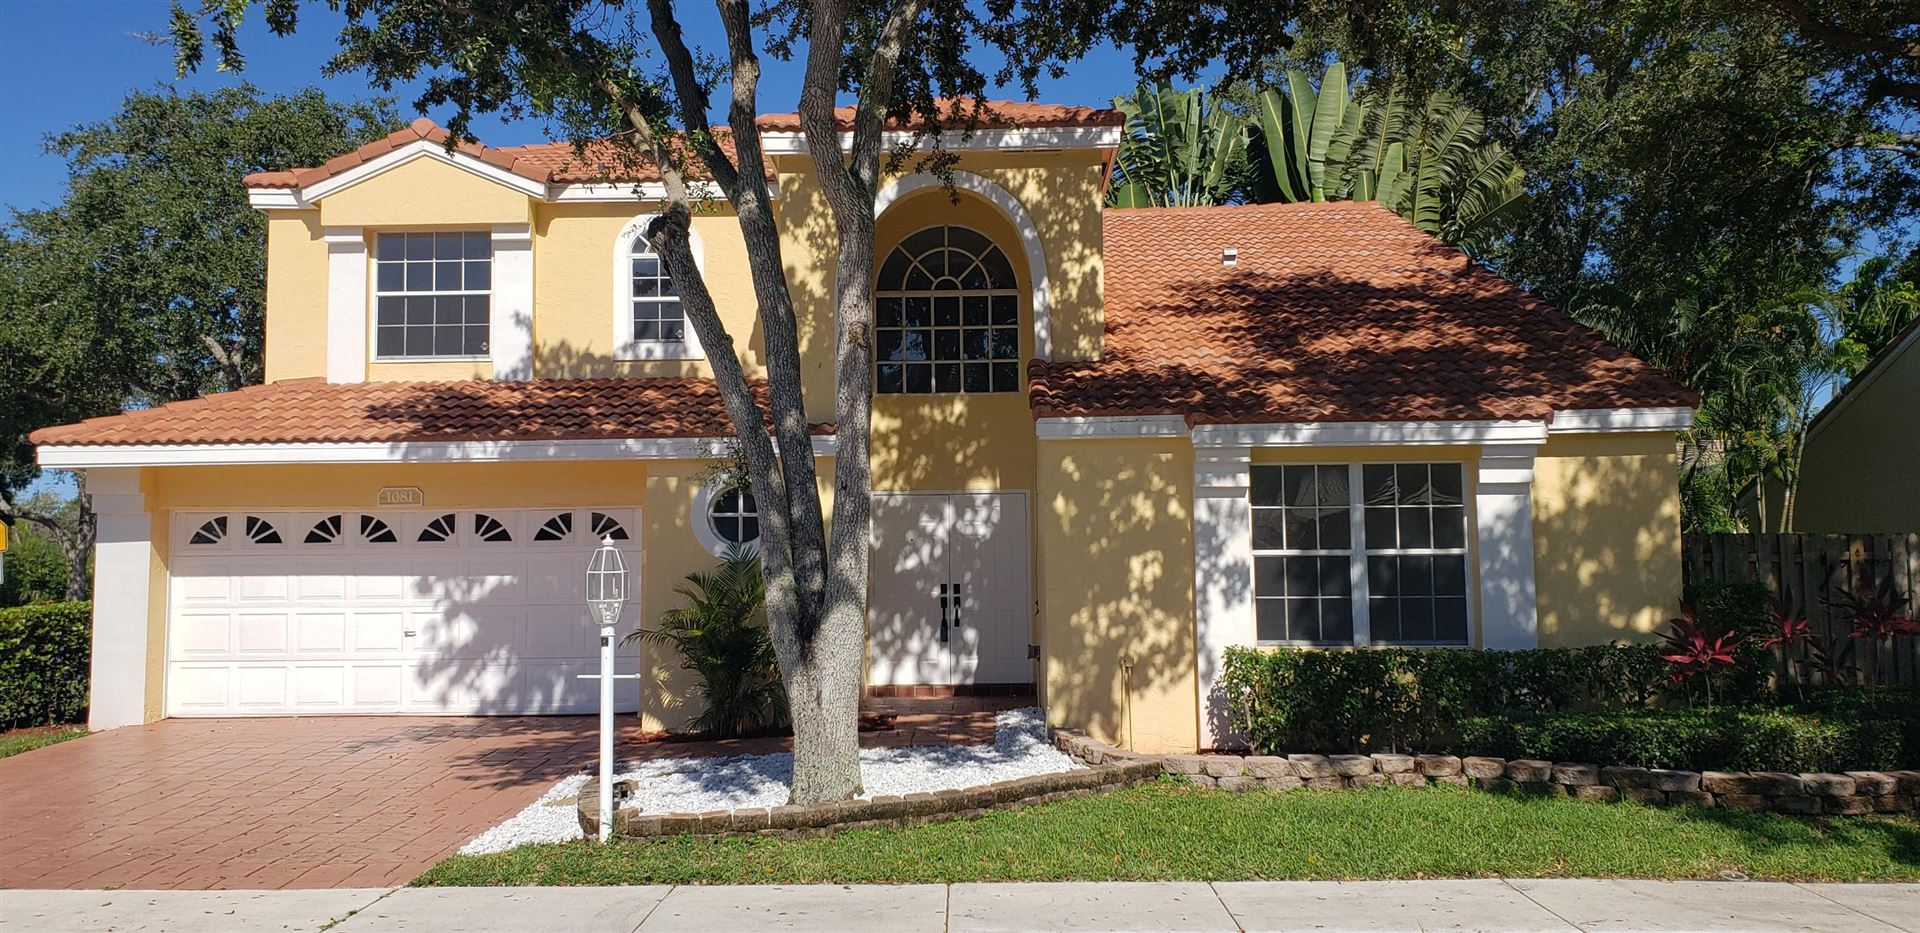 1081 Siena Oaks Circle E, Palm Beach Gardens, FL 33410 - MLS#: RX-10740134